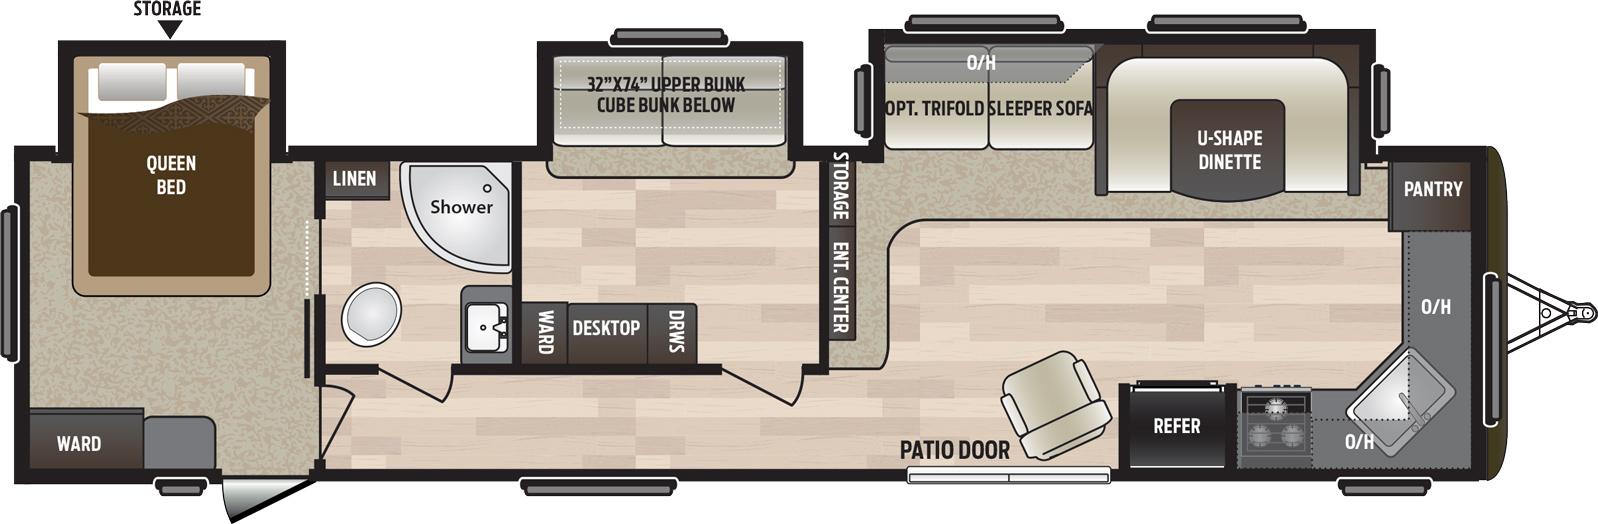 2019 KEYSTONE HIDEOUT 38FKTS (bunks) Floorplan